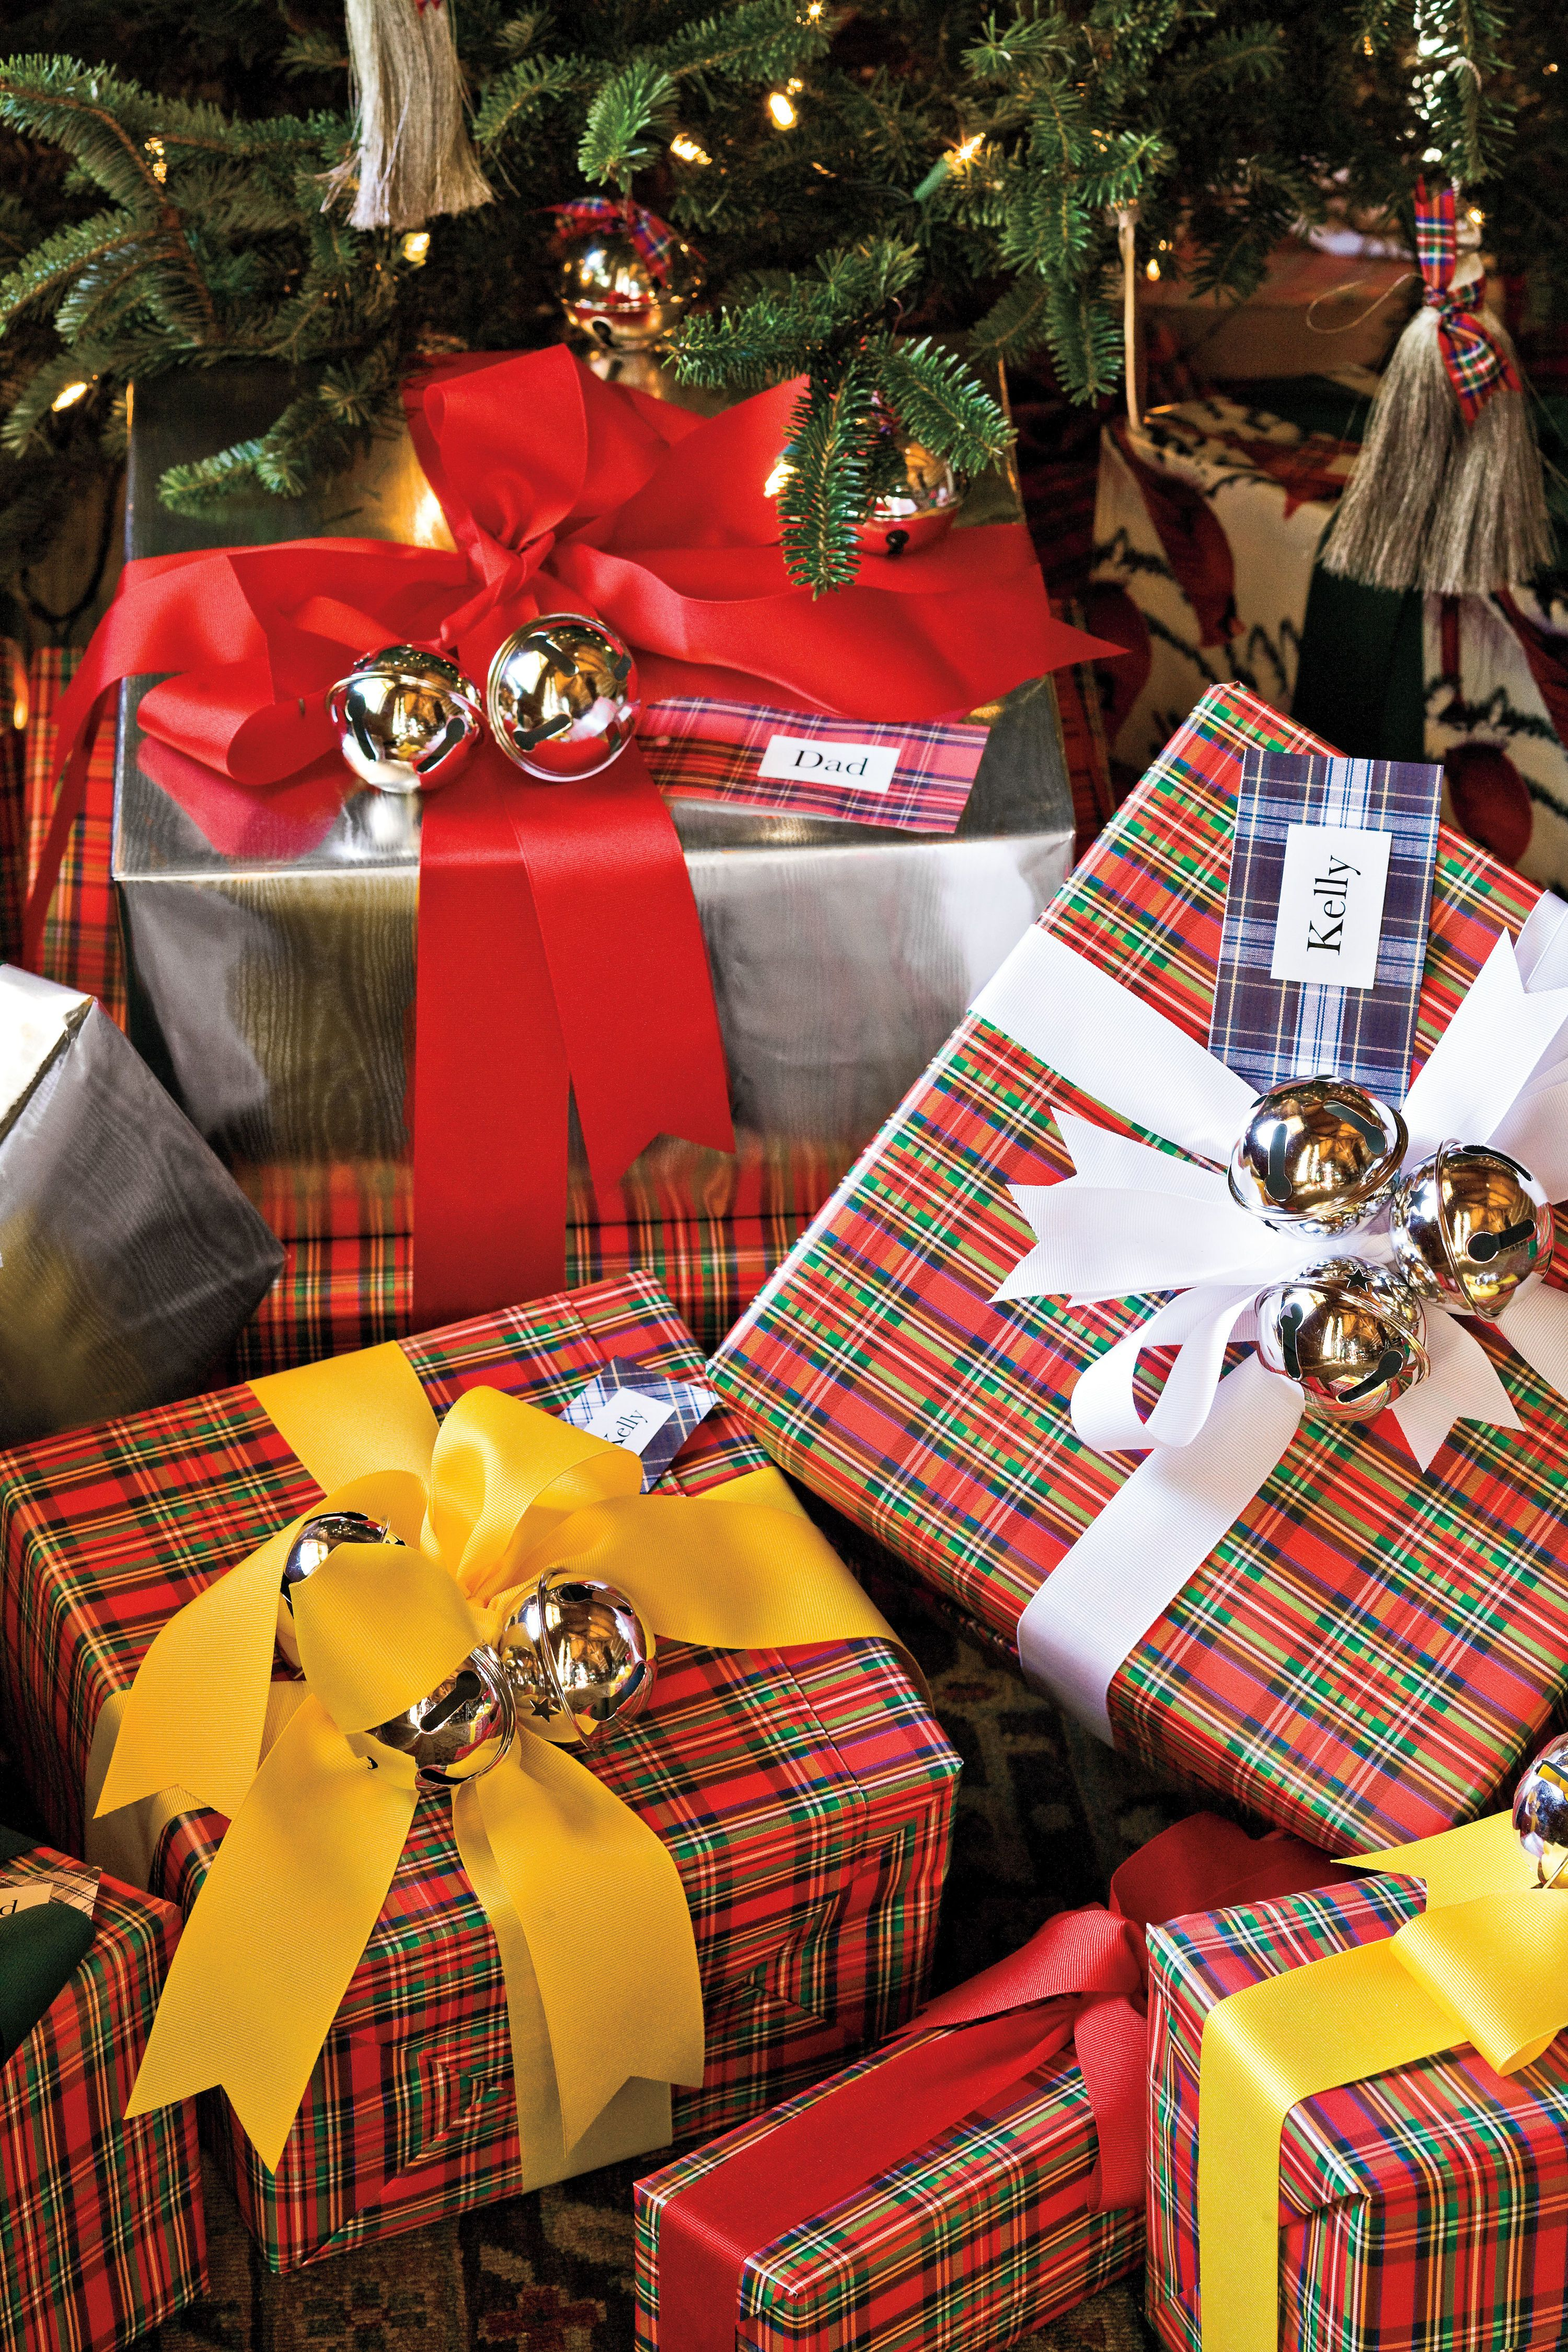 100 Best Ever Christmas Decorating Ideas Christmas Gift Wrapping Christmas Decorations Christmas Wrapping